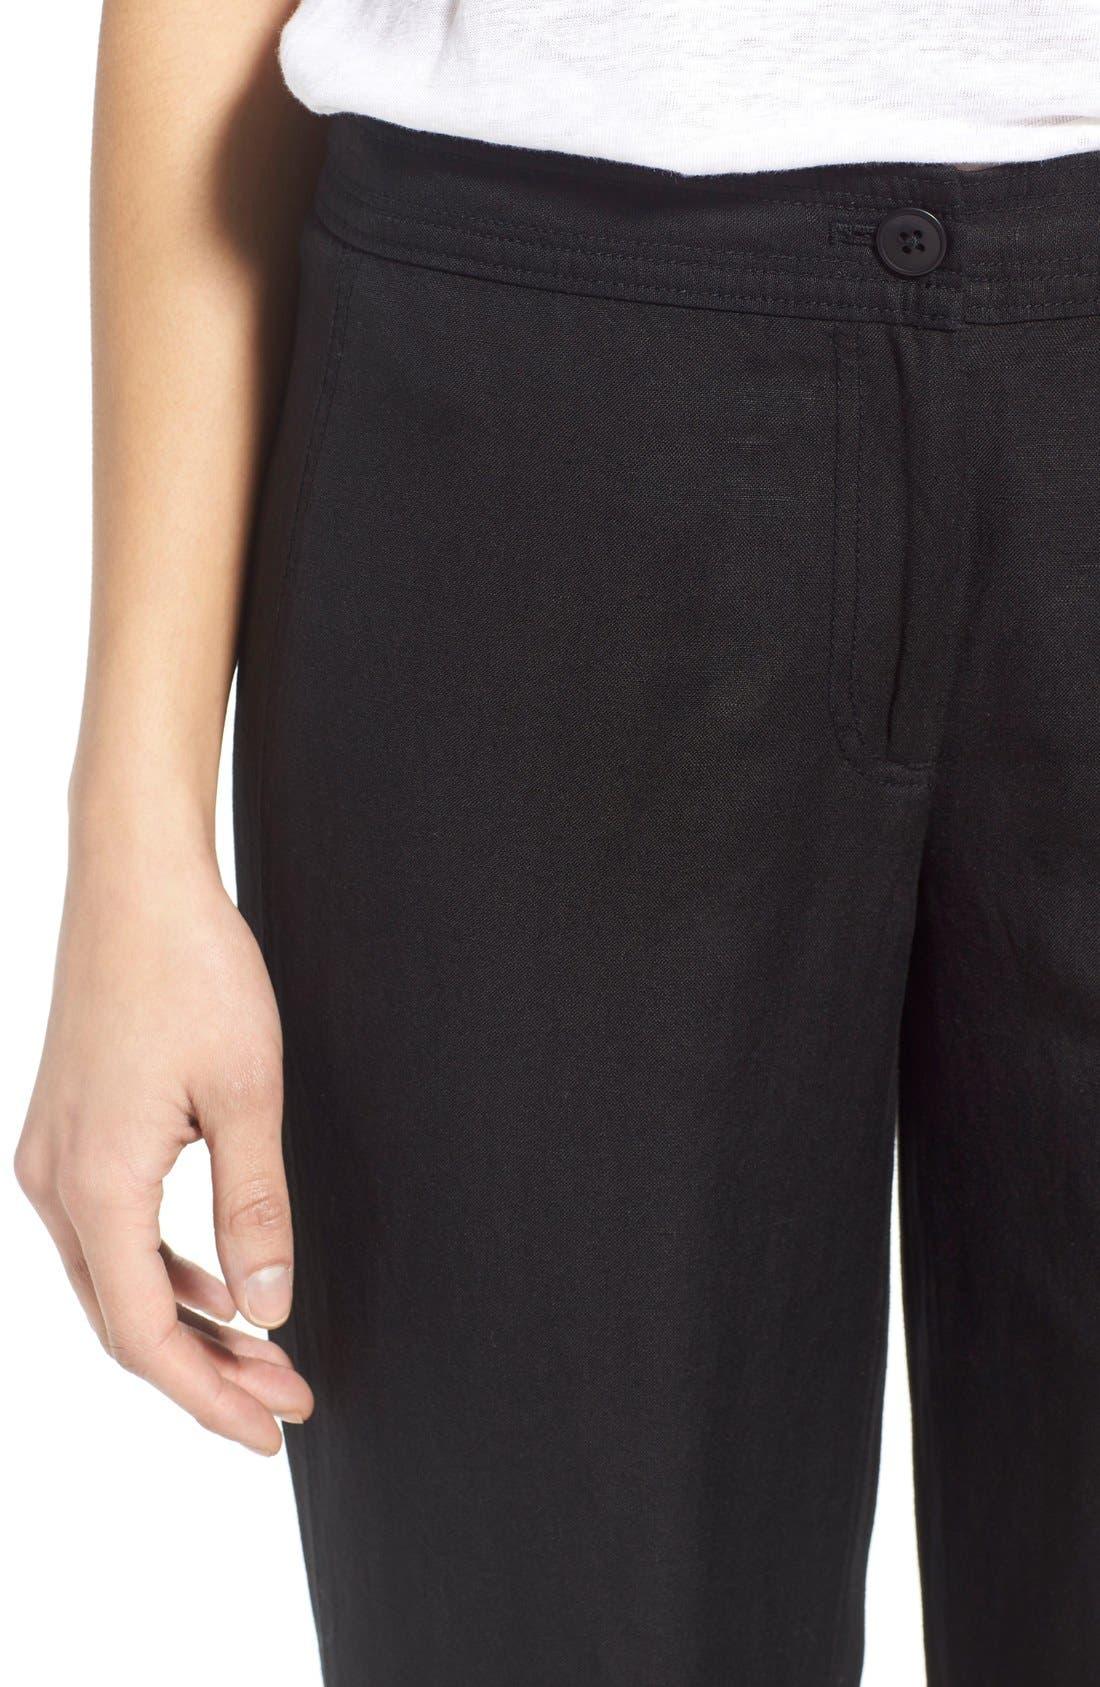 'Easy' Linen Blend Wide Leg Pants,                             Alternate thumbnail 5, color,                             004